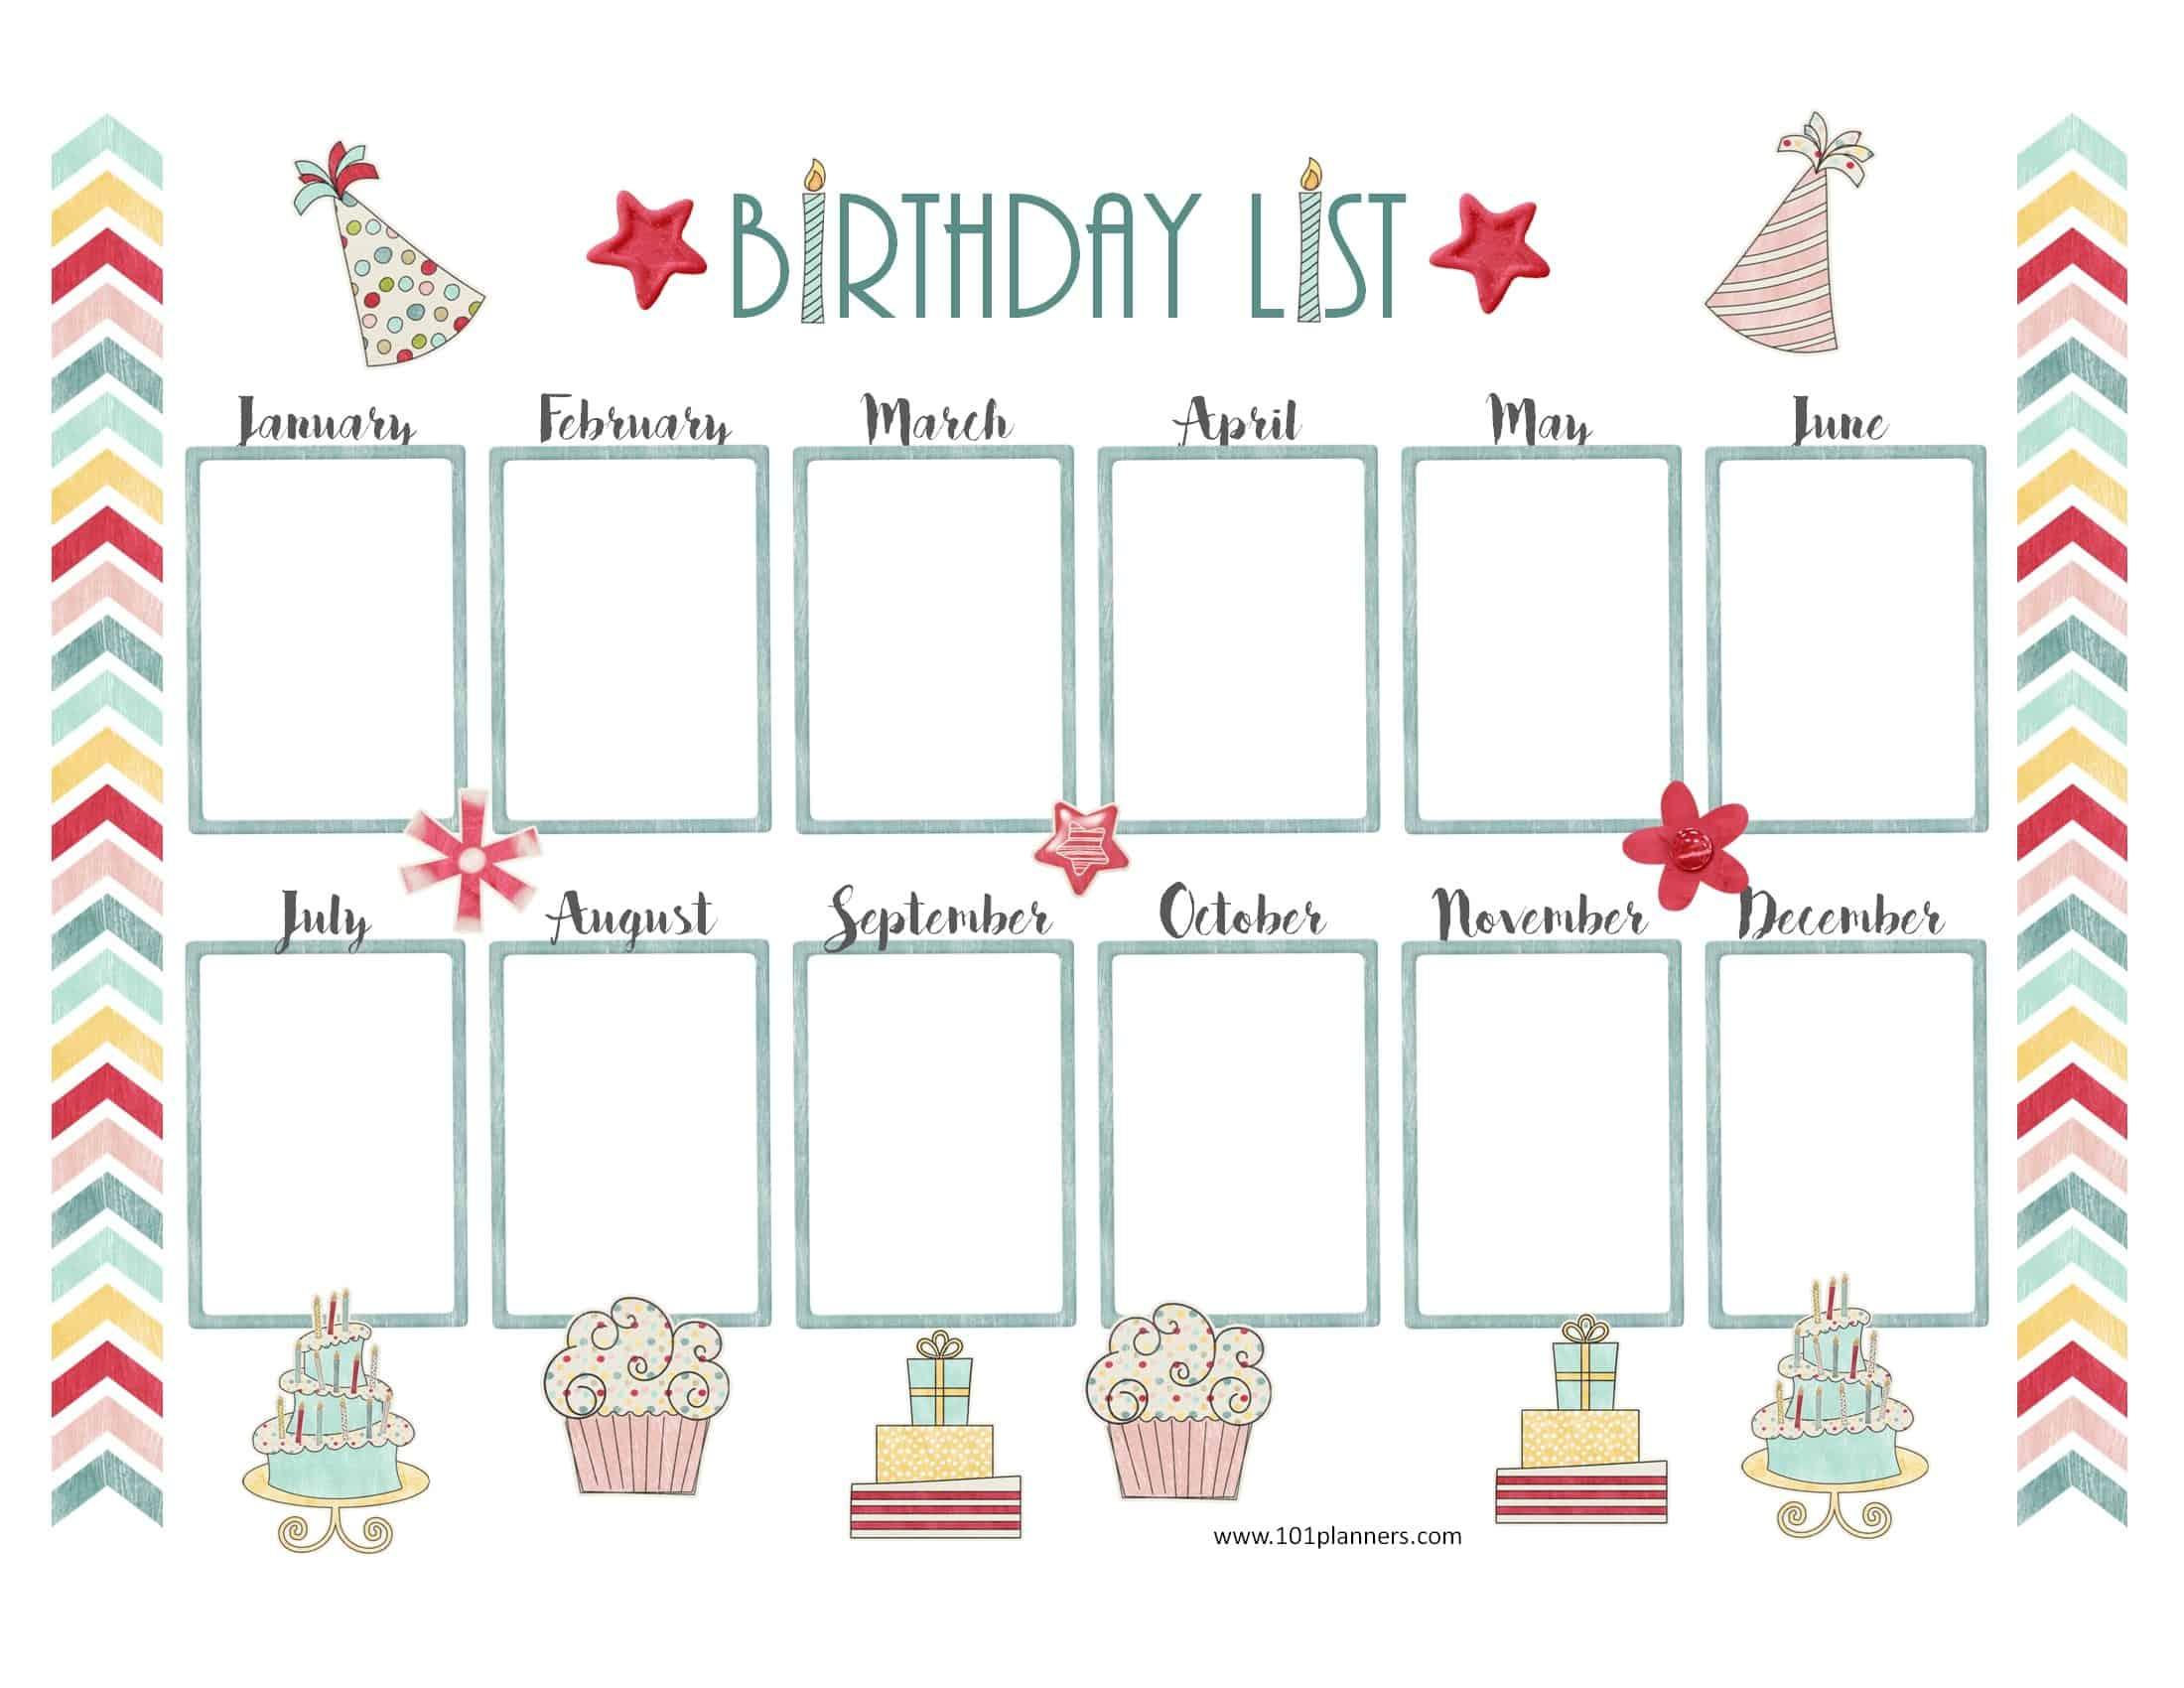 Free Birthday Calendar | Printable & Customizable | Many Designs! with regard to Blank Calendar Chart For Classrooms